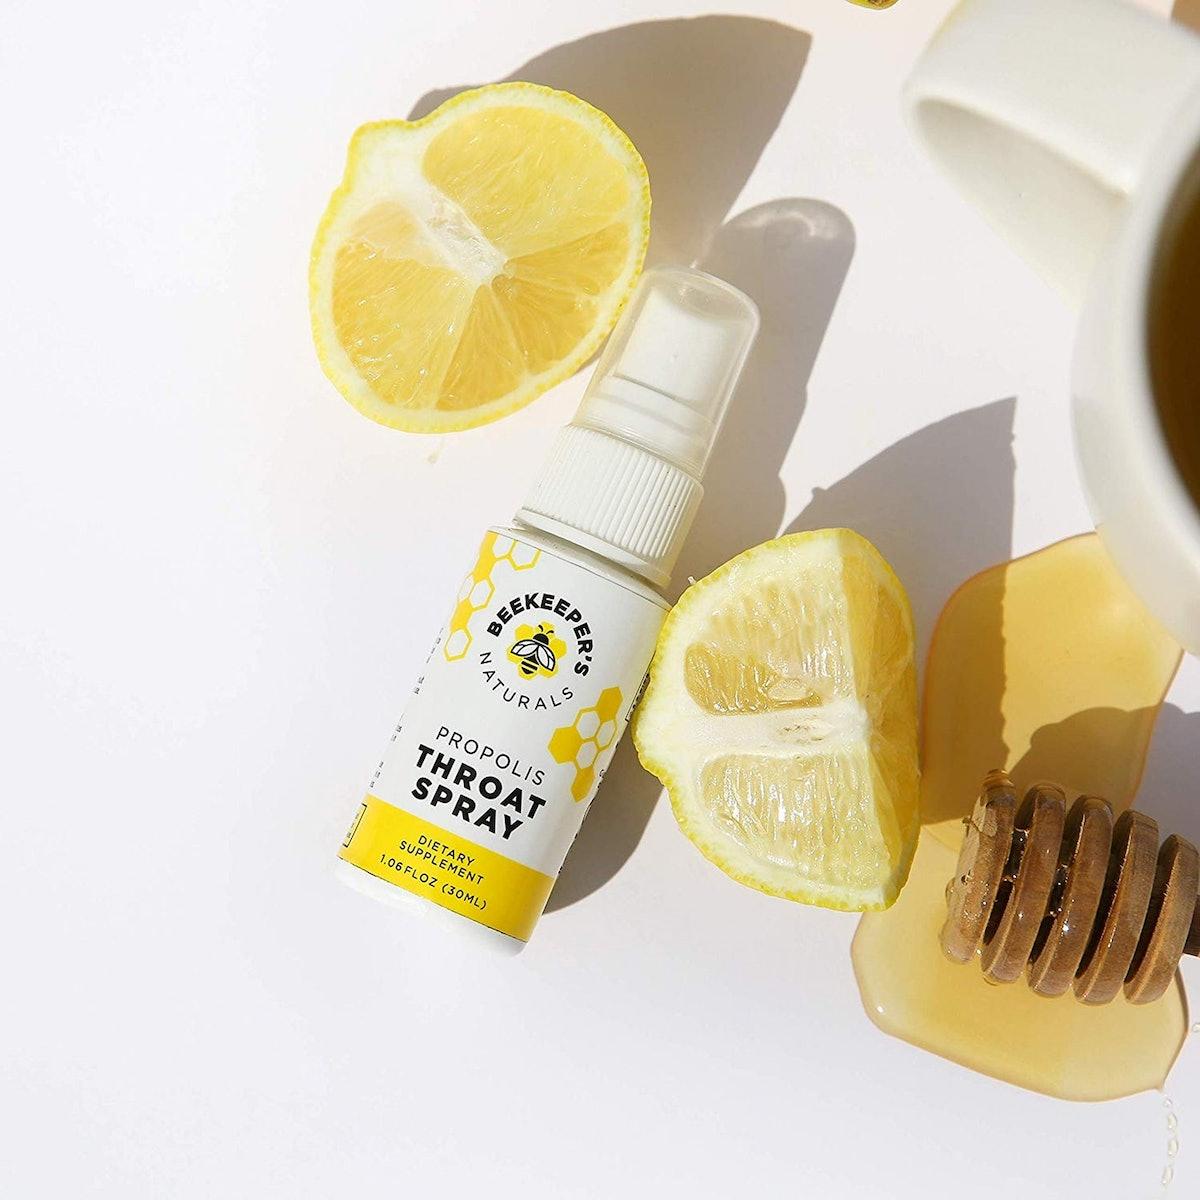 Beekeeper's Naturals Bee Propolis Natural Throat Spray